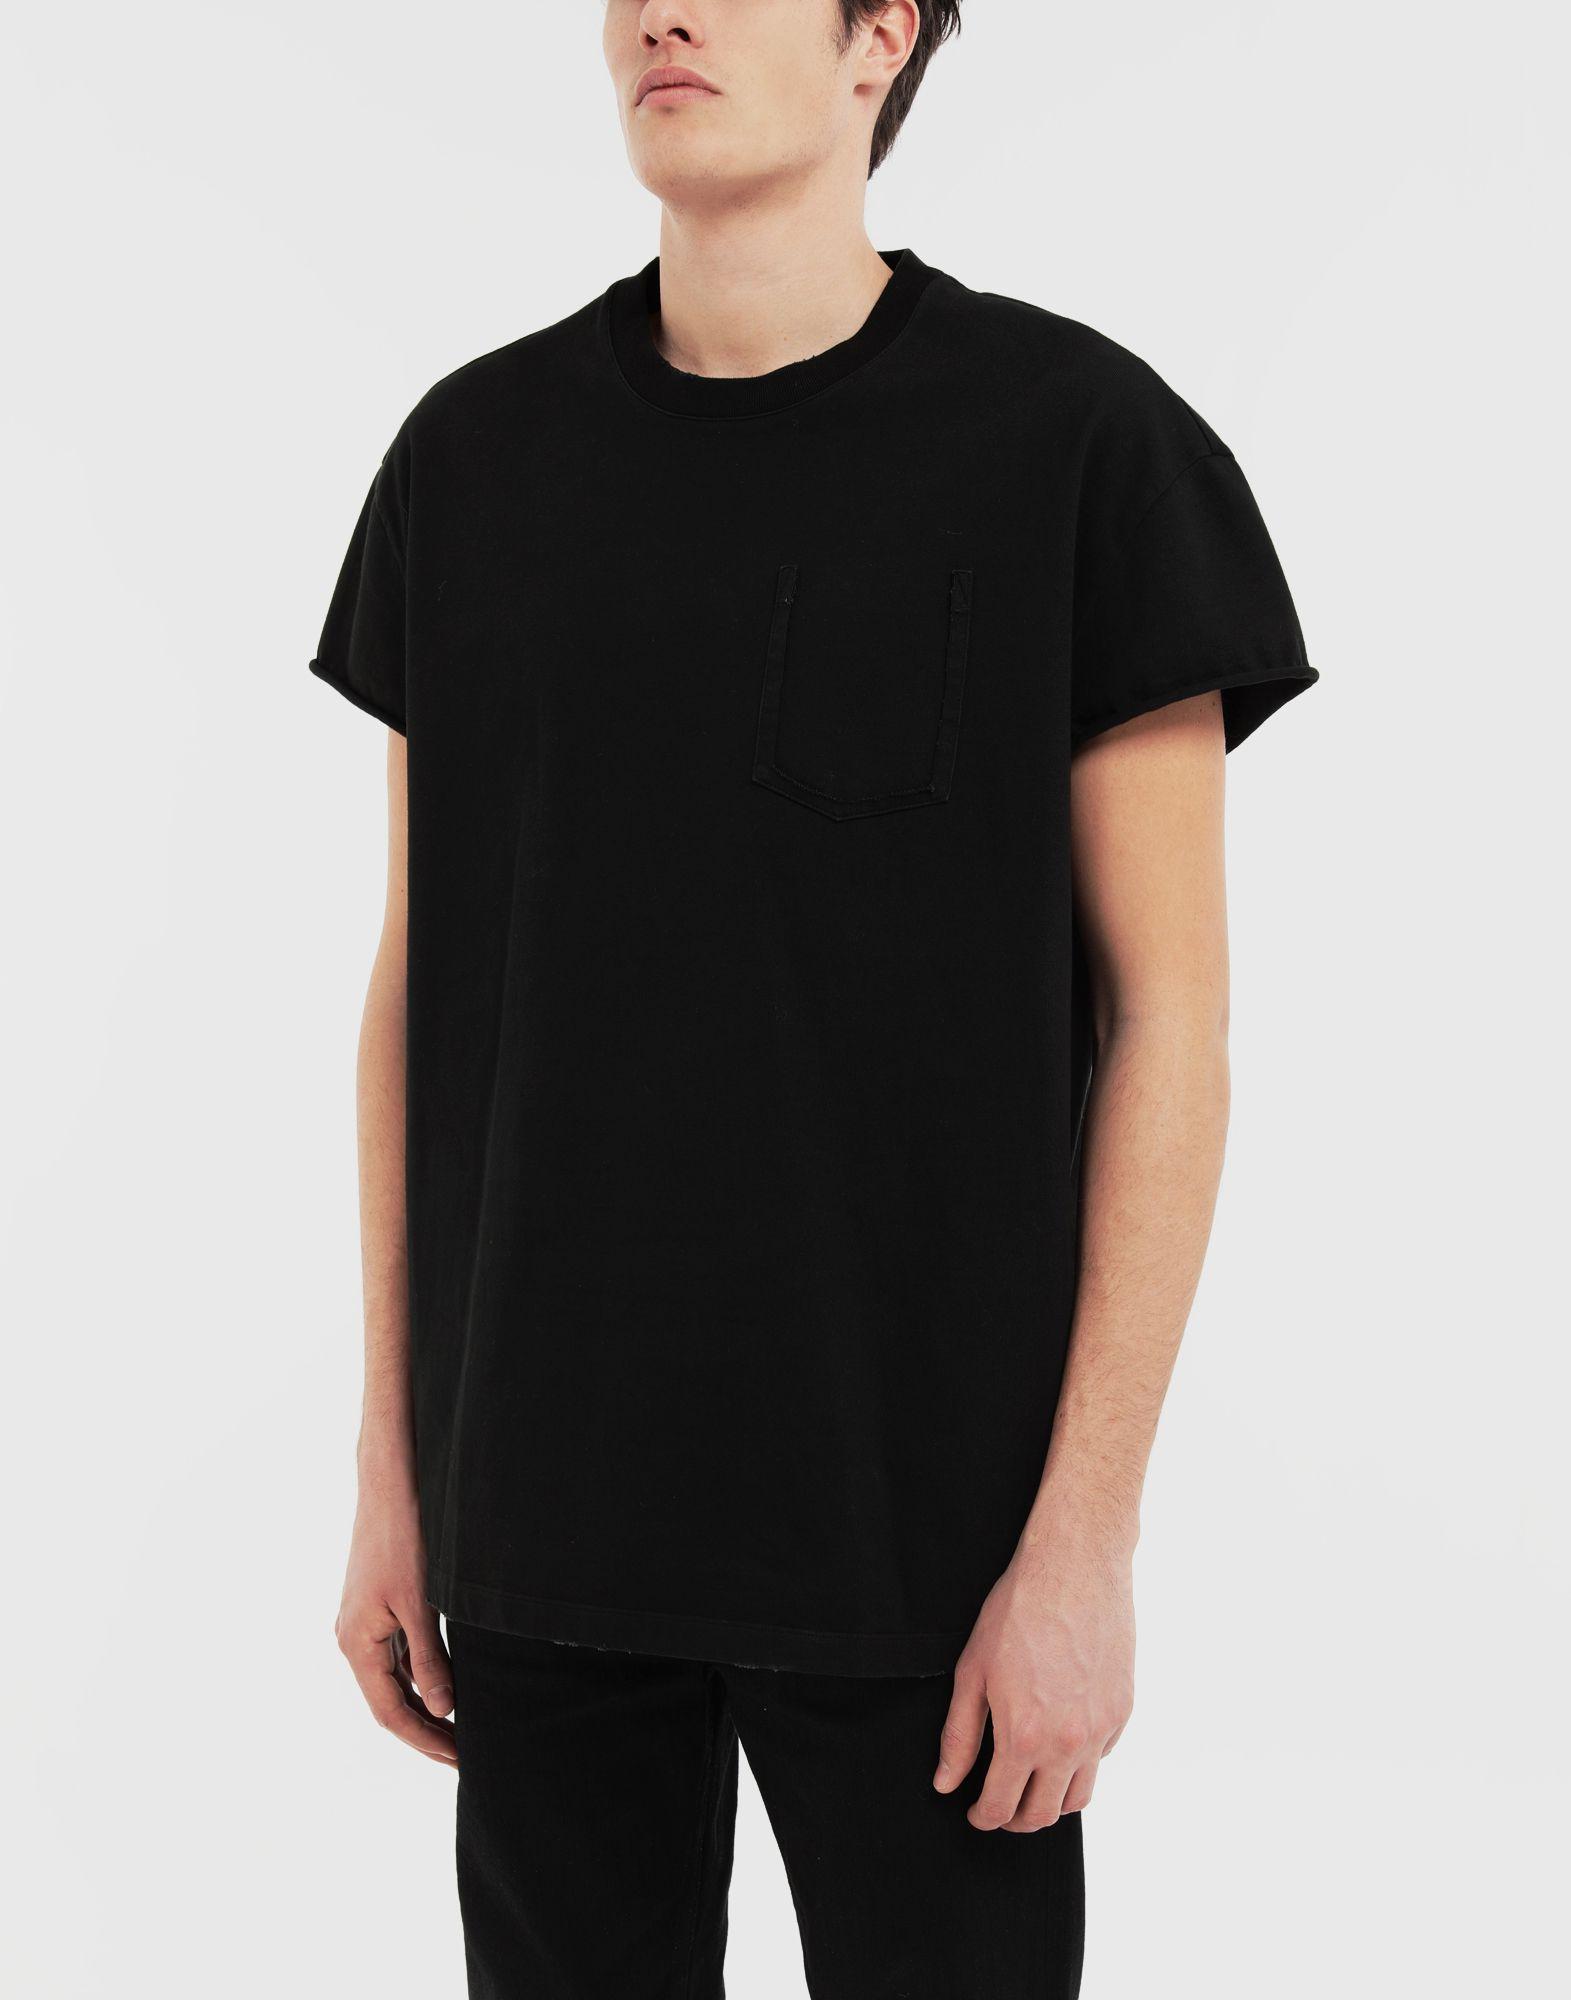 MAISON MARGIELA Oversized T-shirt Short sleeve t-shirt Man r